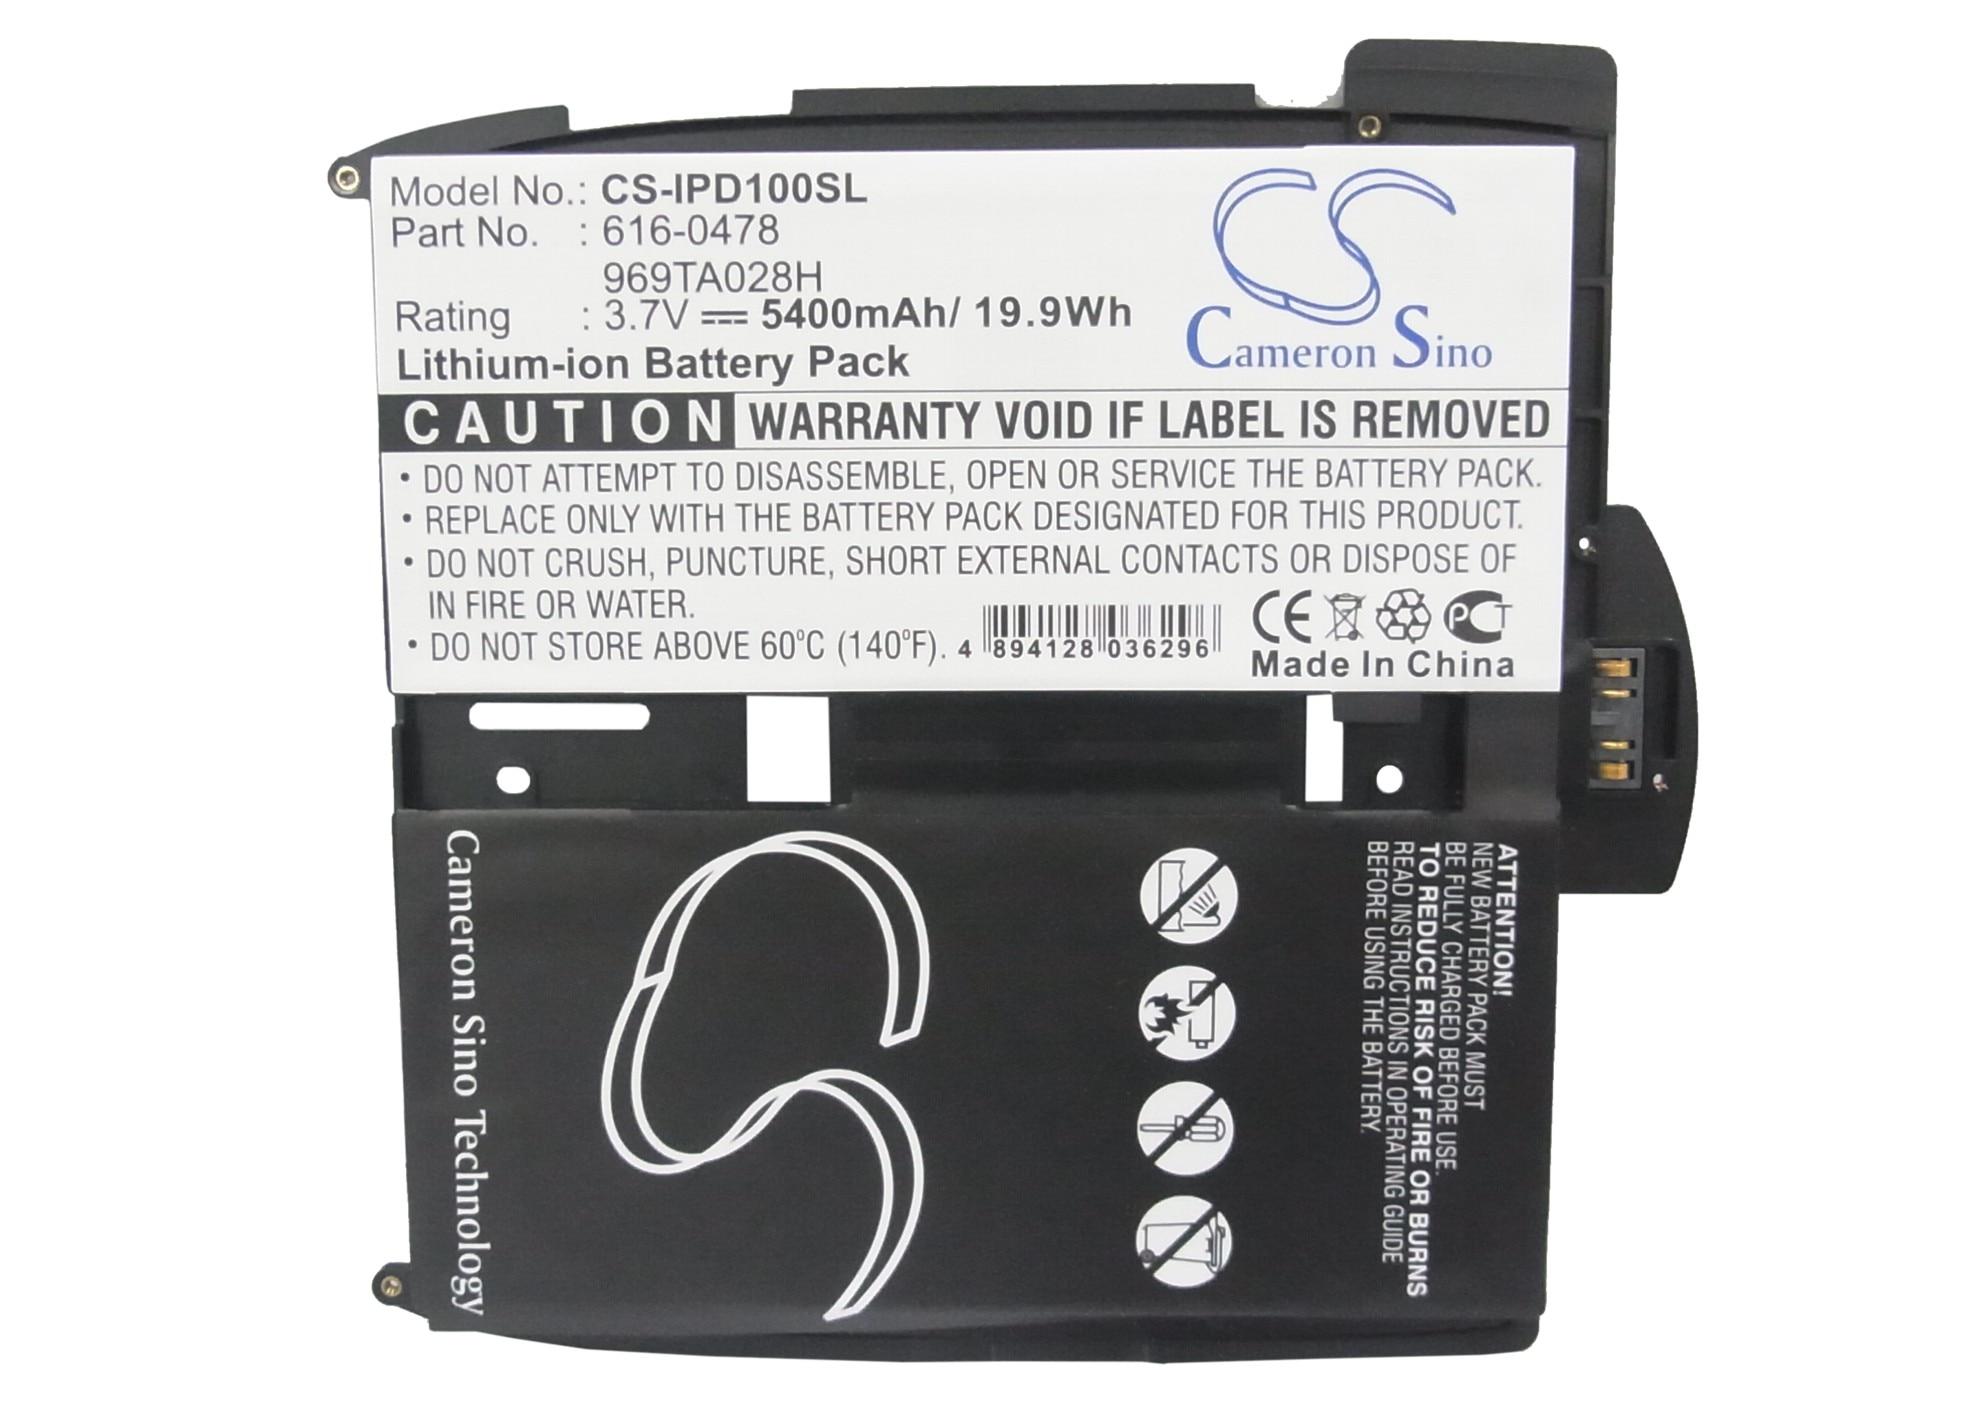 Cameron Sino 5400 Mah Batterie 616-0448 A1337 Fein Verarbeitet A1219 969ta028h Für Apple I-pad 1st 616-0478 A1315